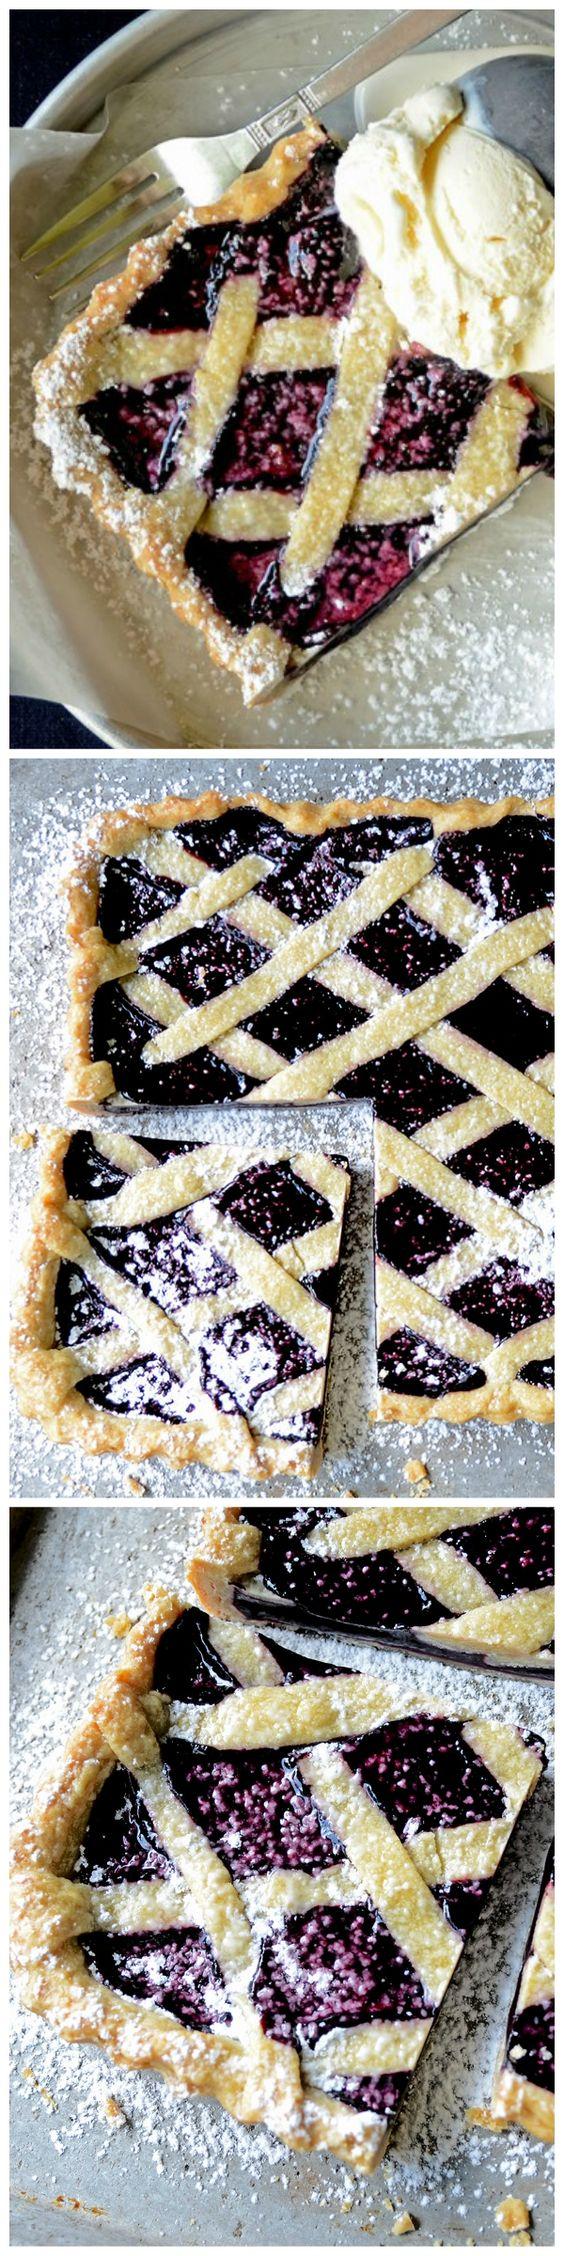 ... ice cream hacks the times desserts seasons cream recipe black the o